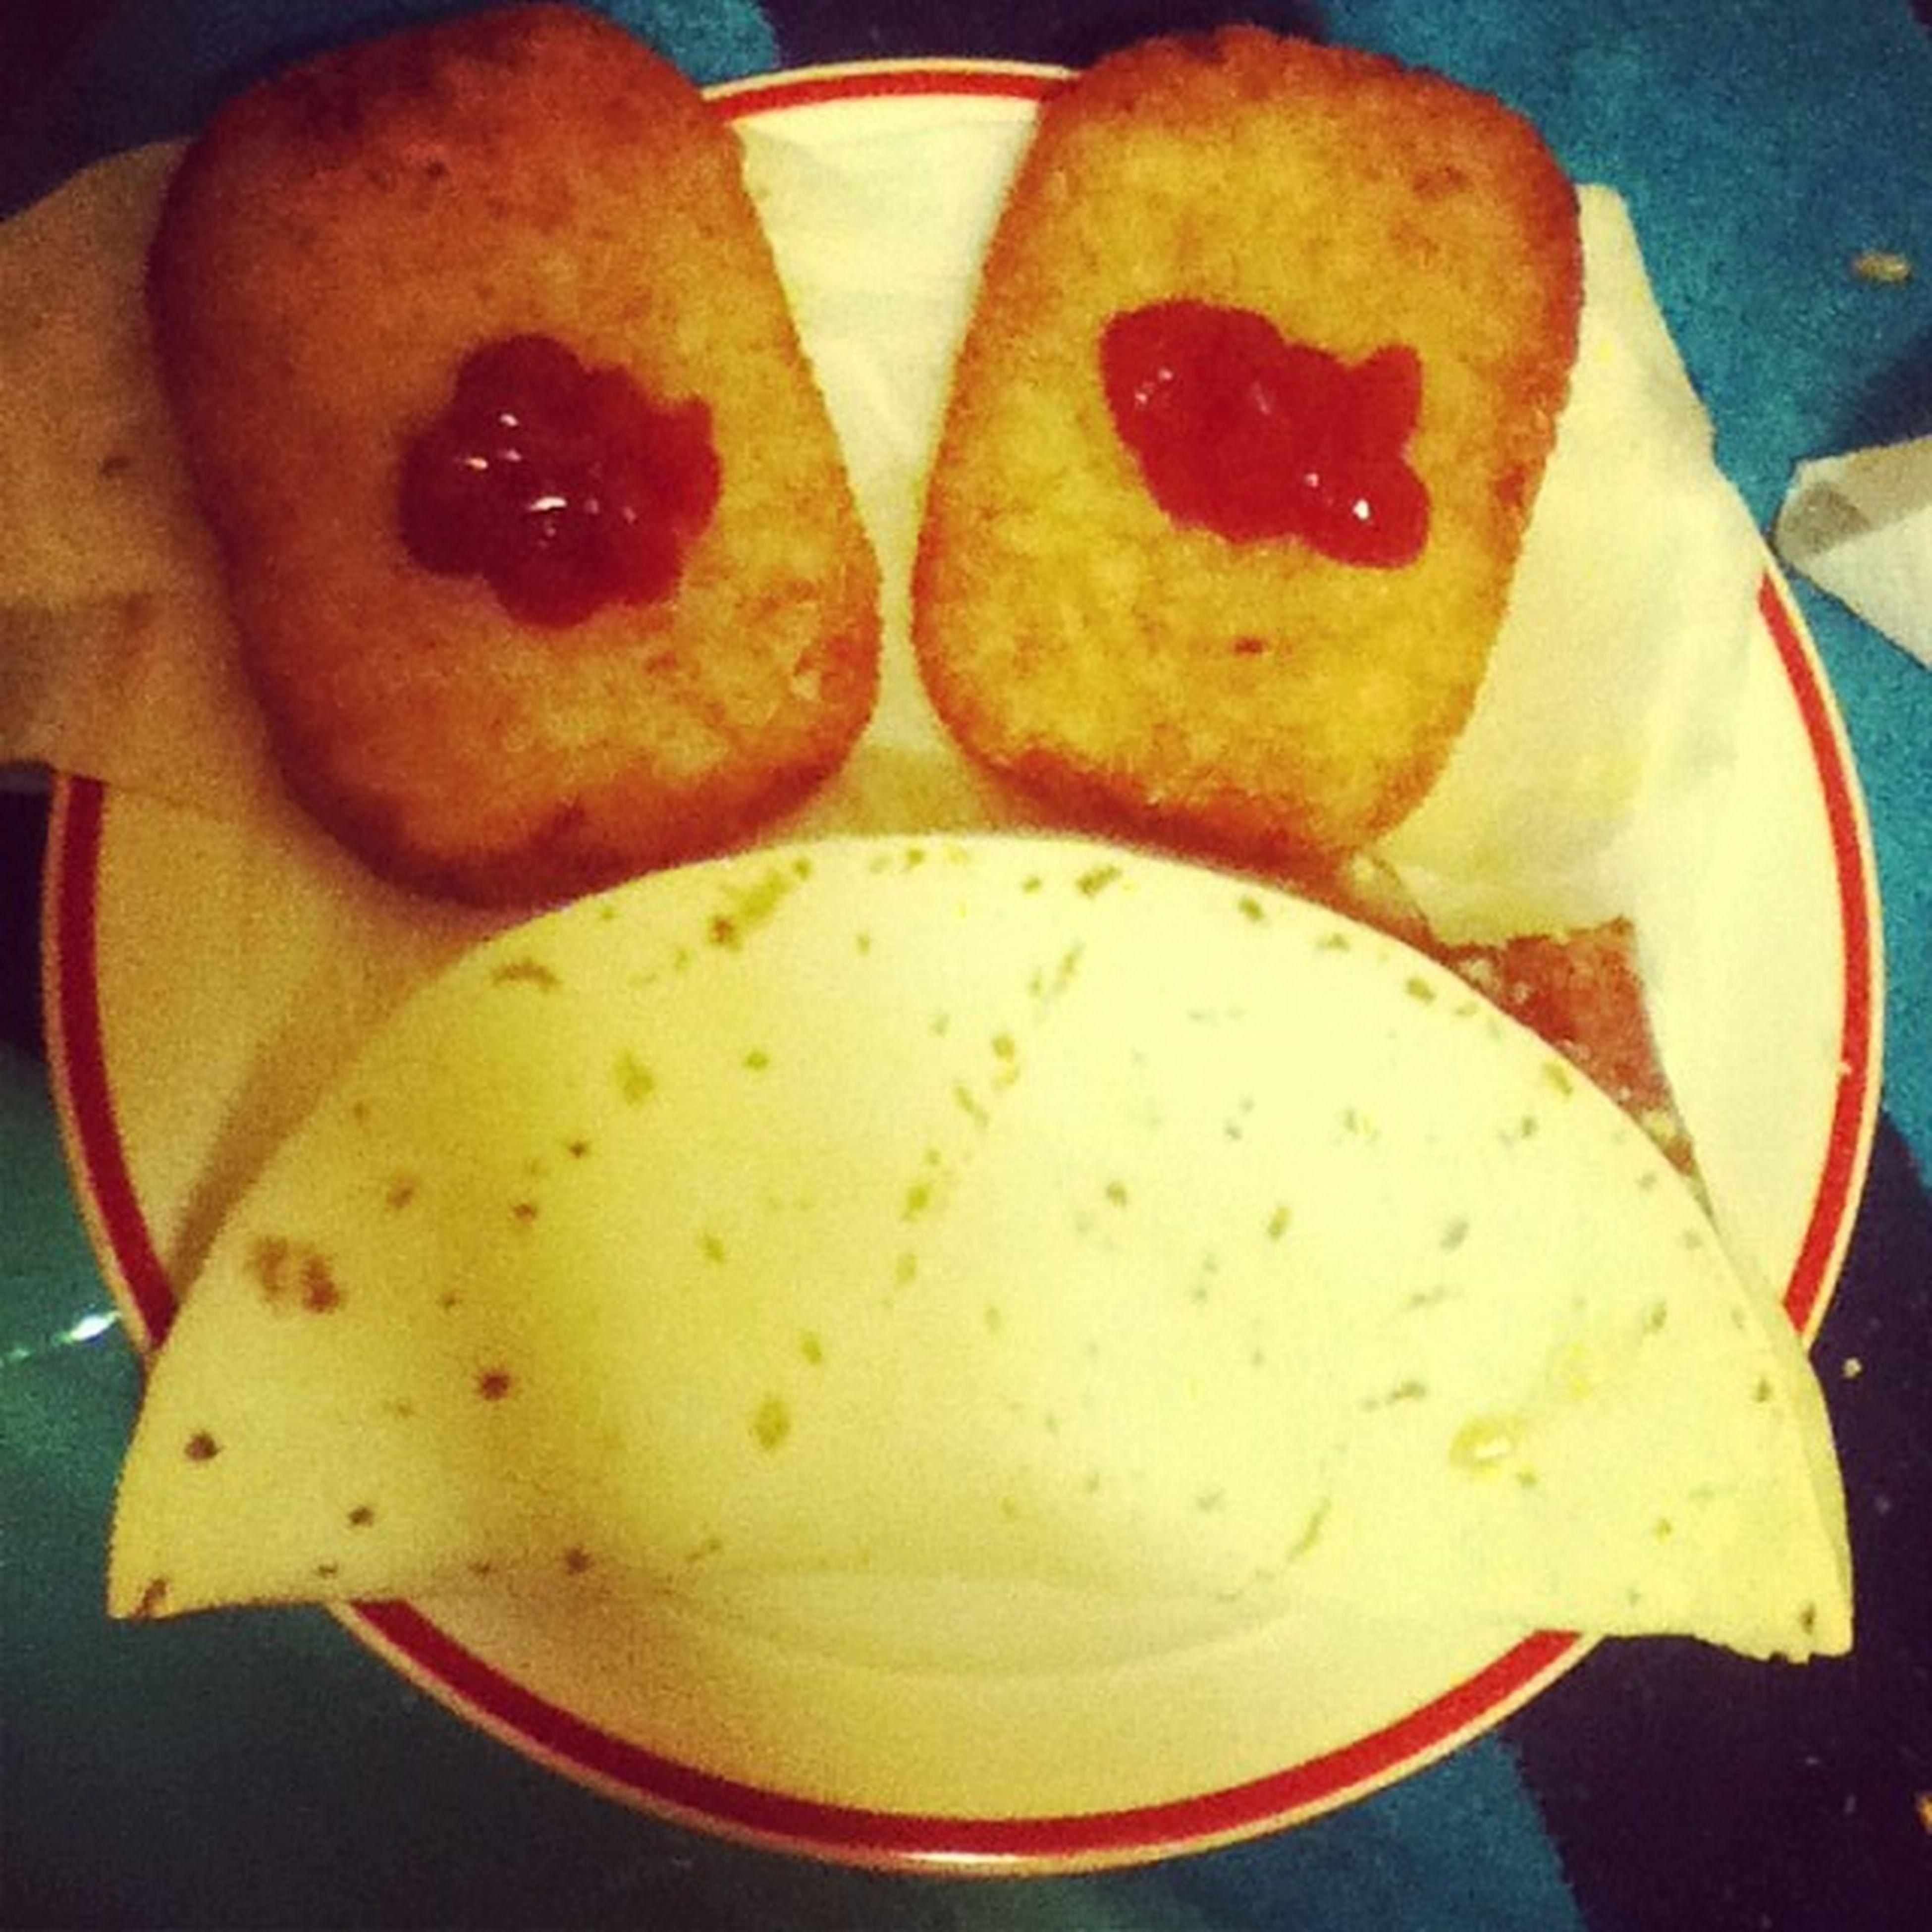 My breakfast is a success Breakfast Success Tortialla Potatopatties